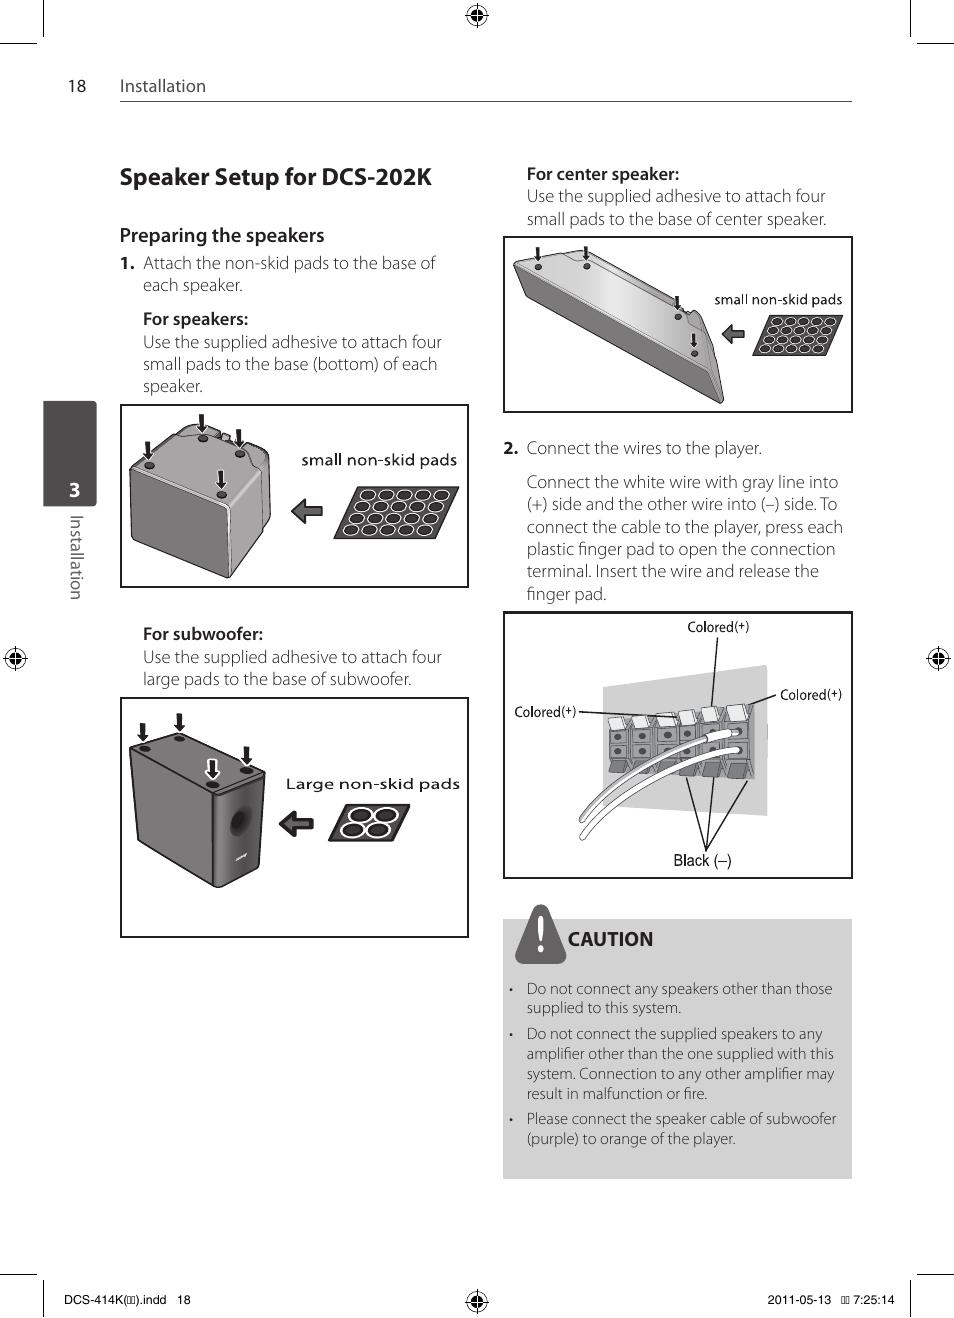 Speaker Setup For Dcs 202k Pioneer 414k User Manual Page 18 Wiring Diagram